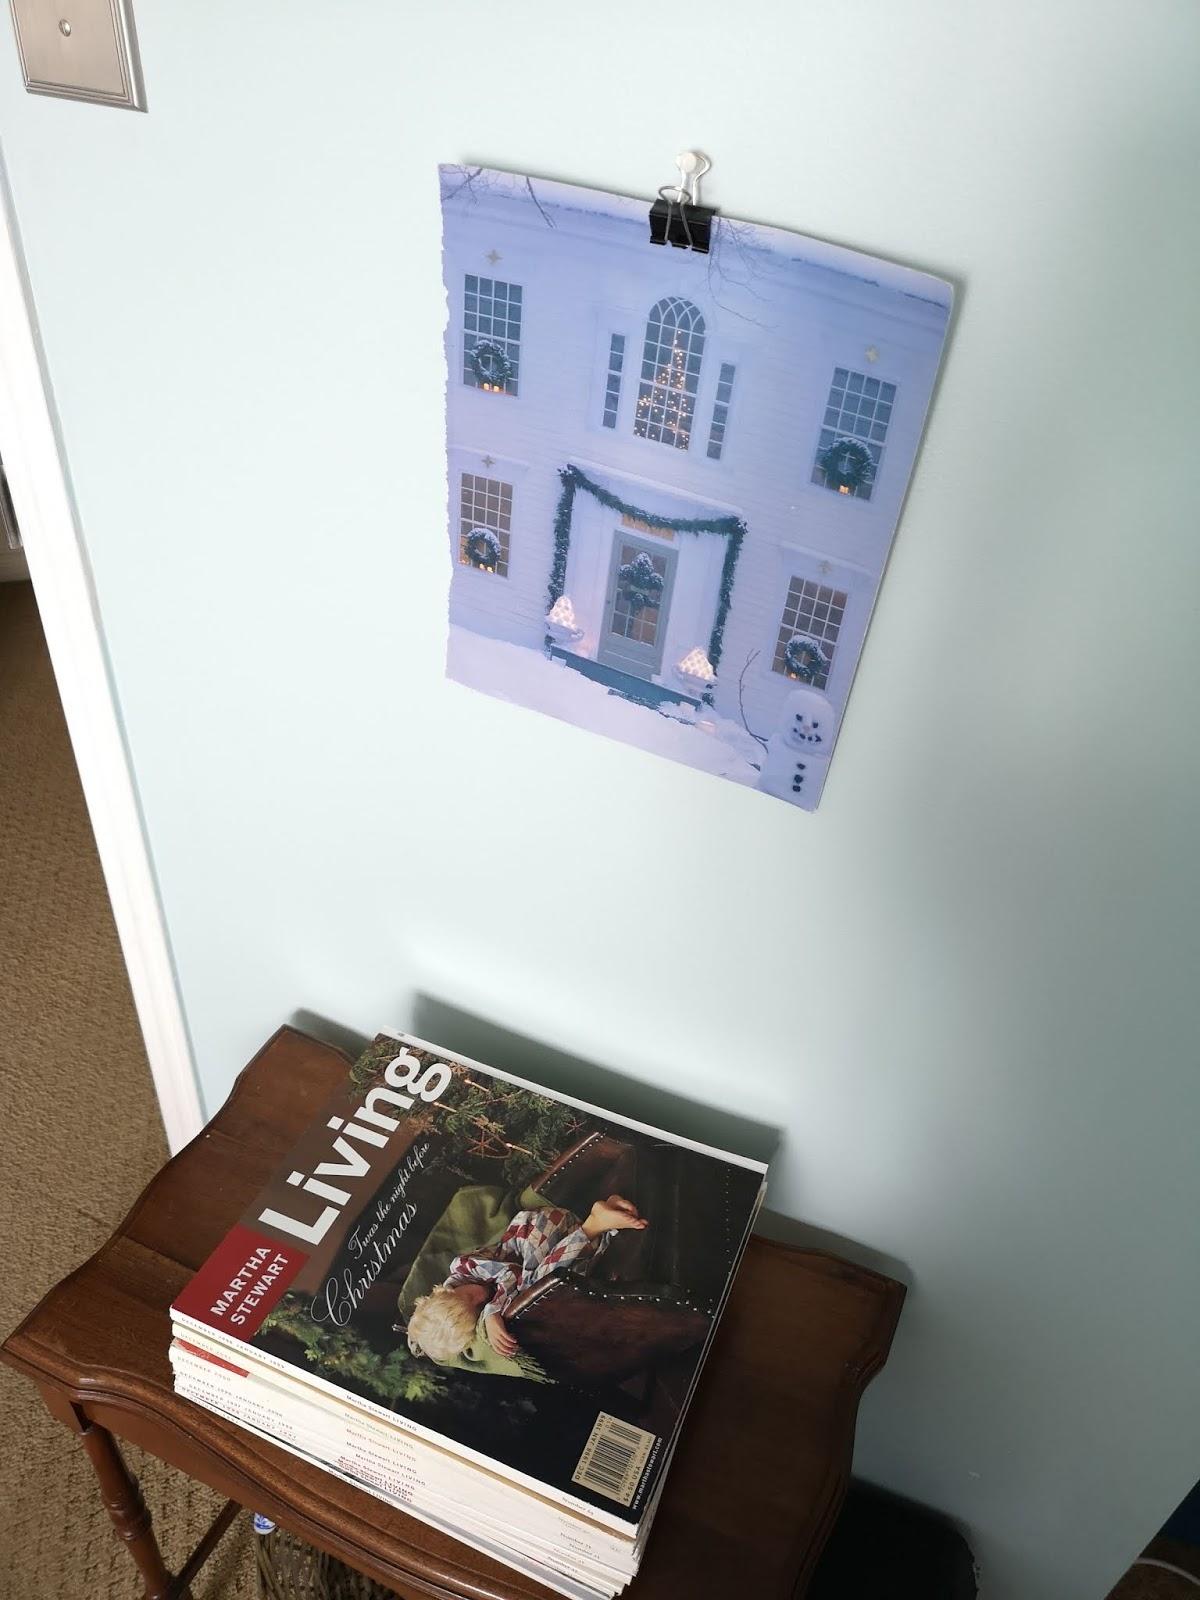 December issues of Martha Stewart Living